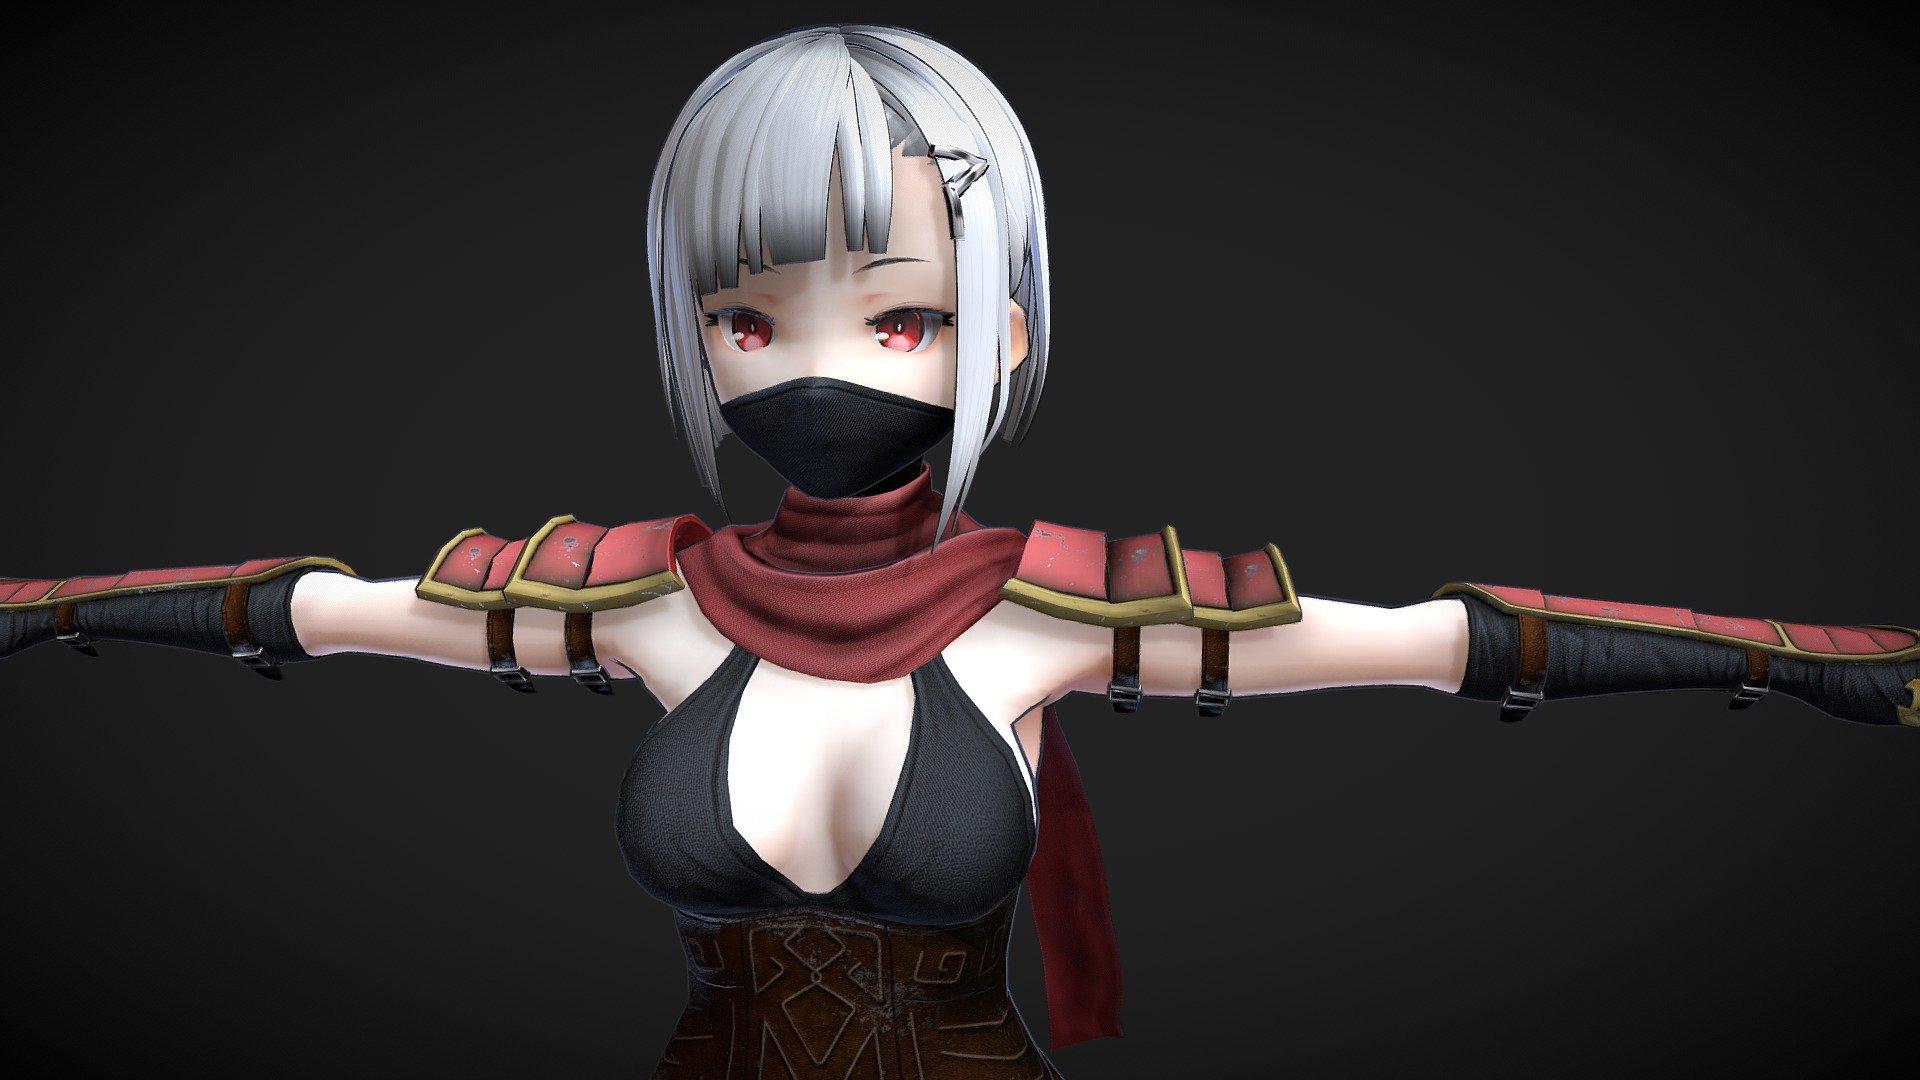 Anime Ninja Girl - Buy Royalty Free 3D model by Bruno Sidarta  (@brunosidarta) [f174601]